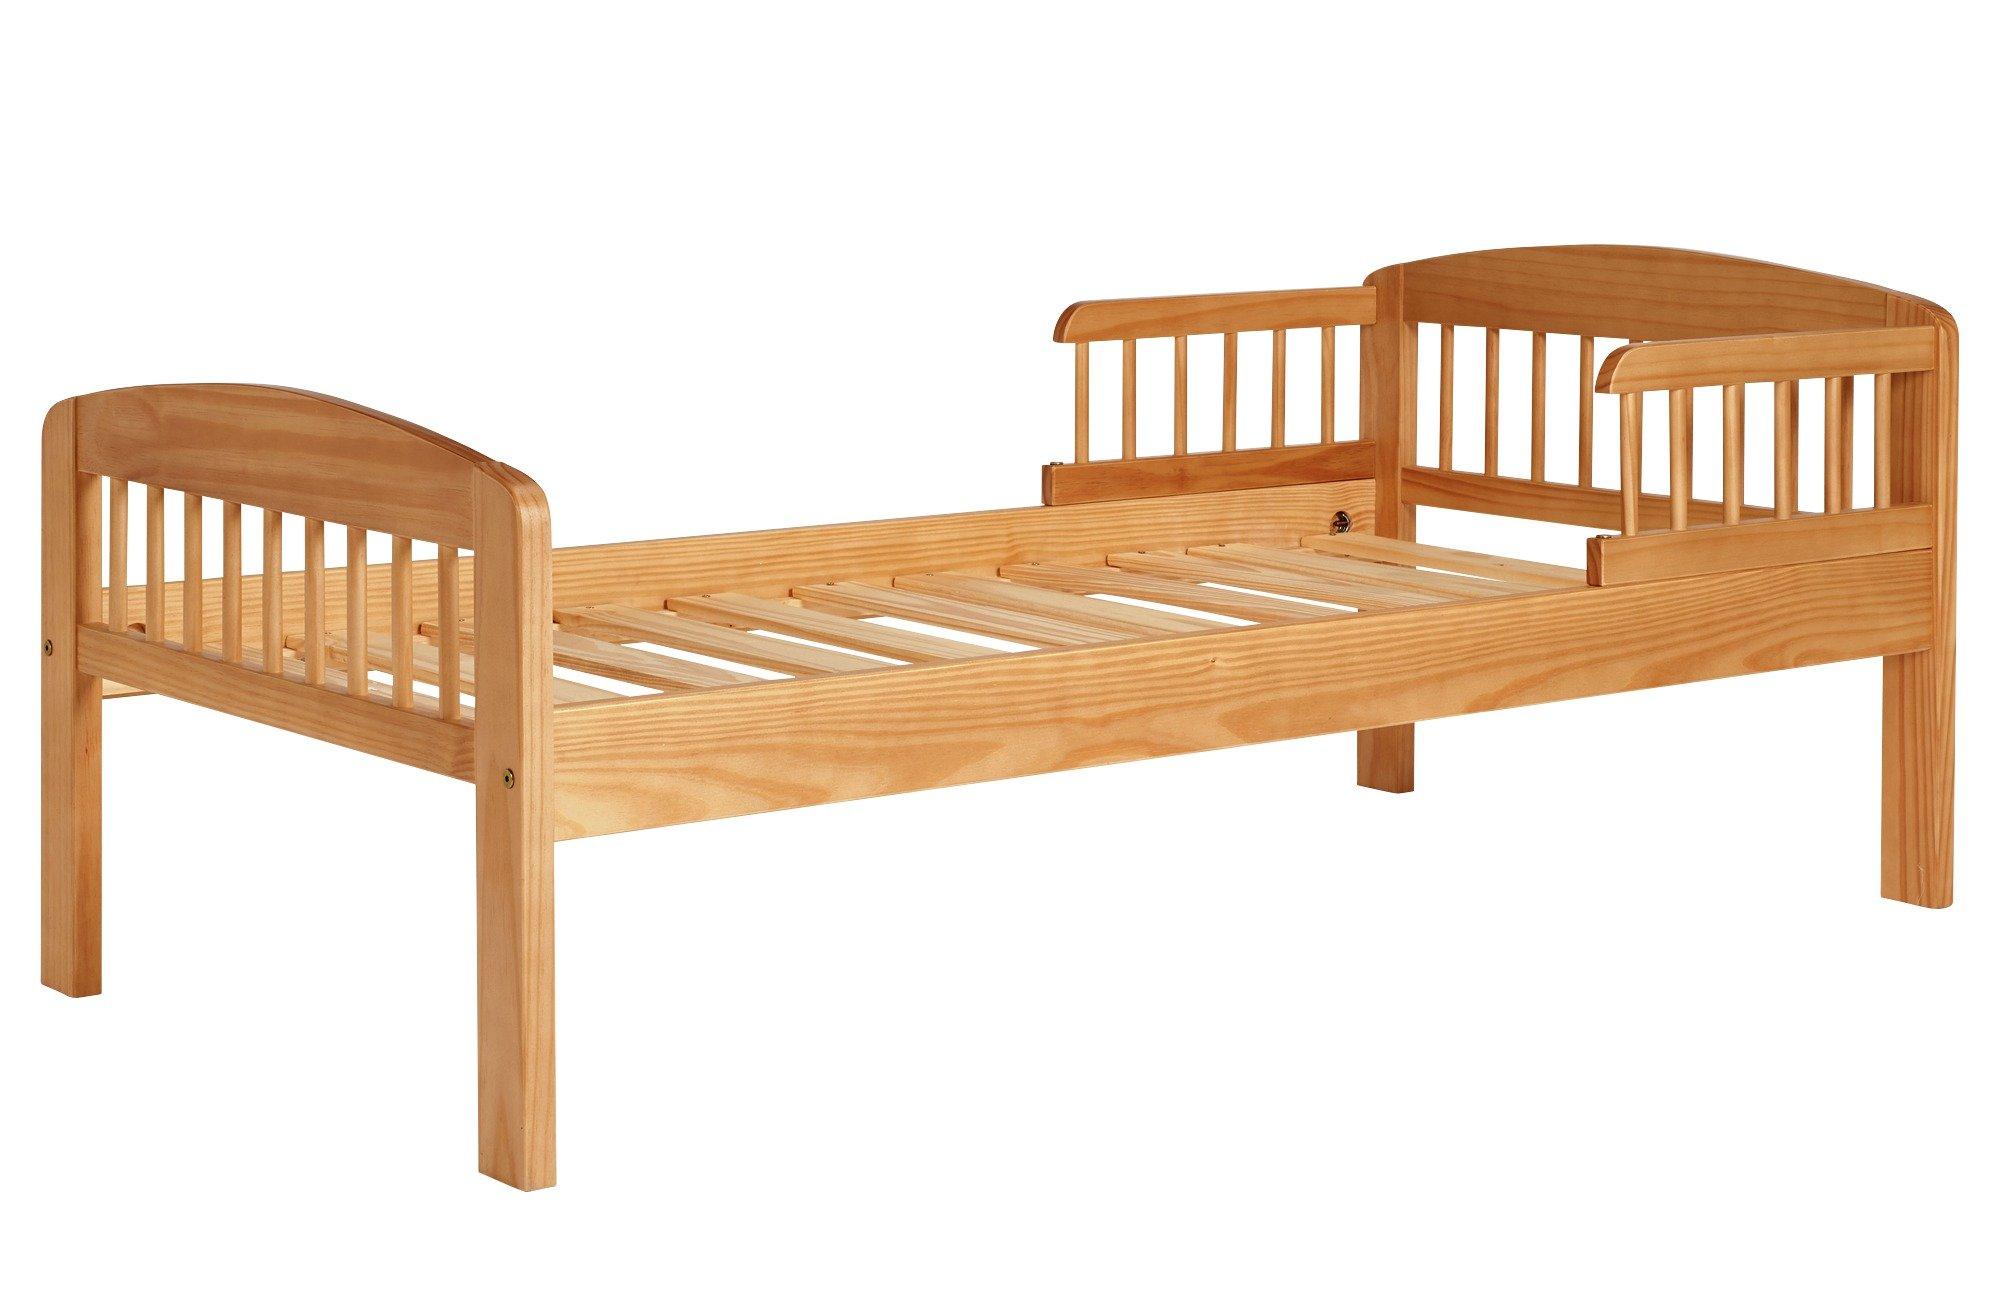 Argos Home Jesse Pine Toddler Bed Frame @ Argos Free C&C £37.49